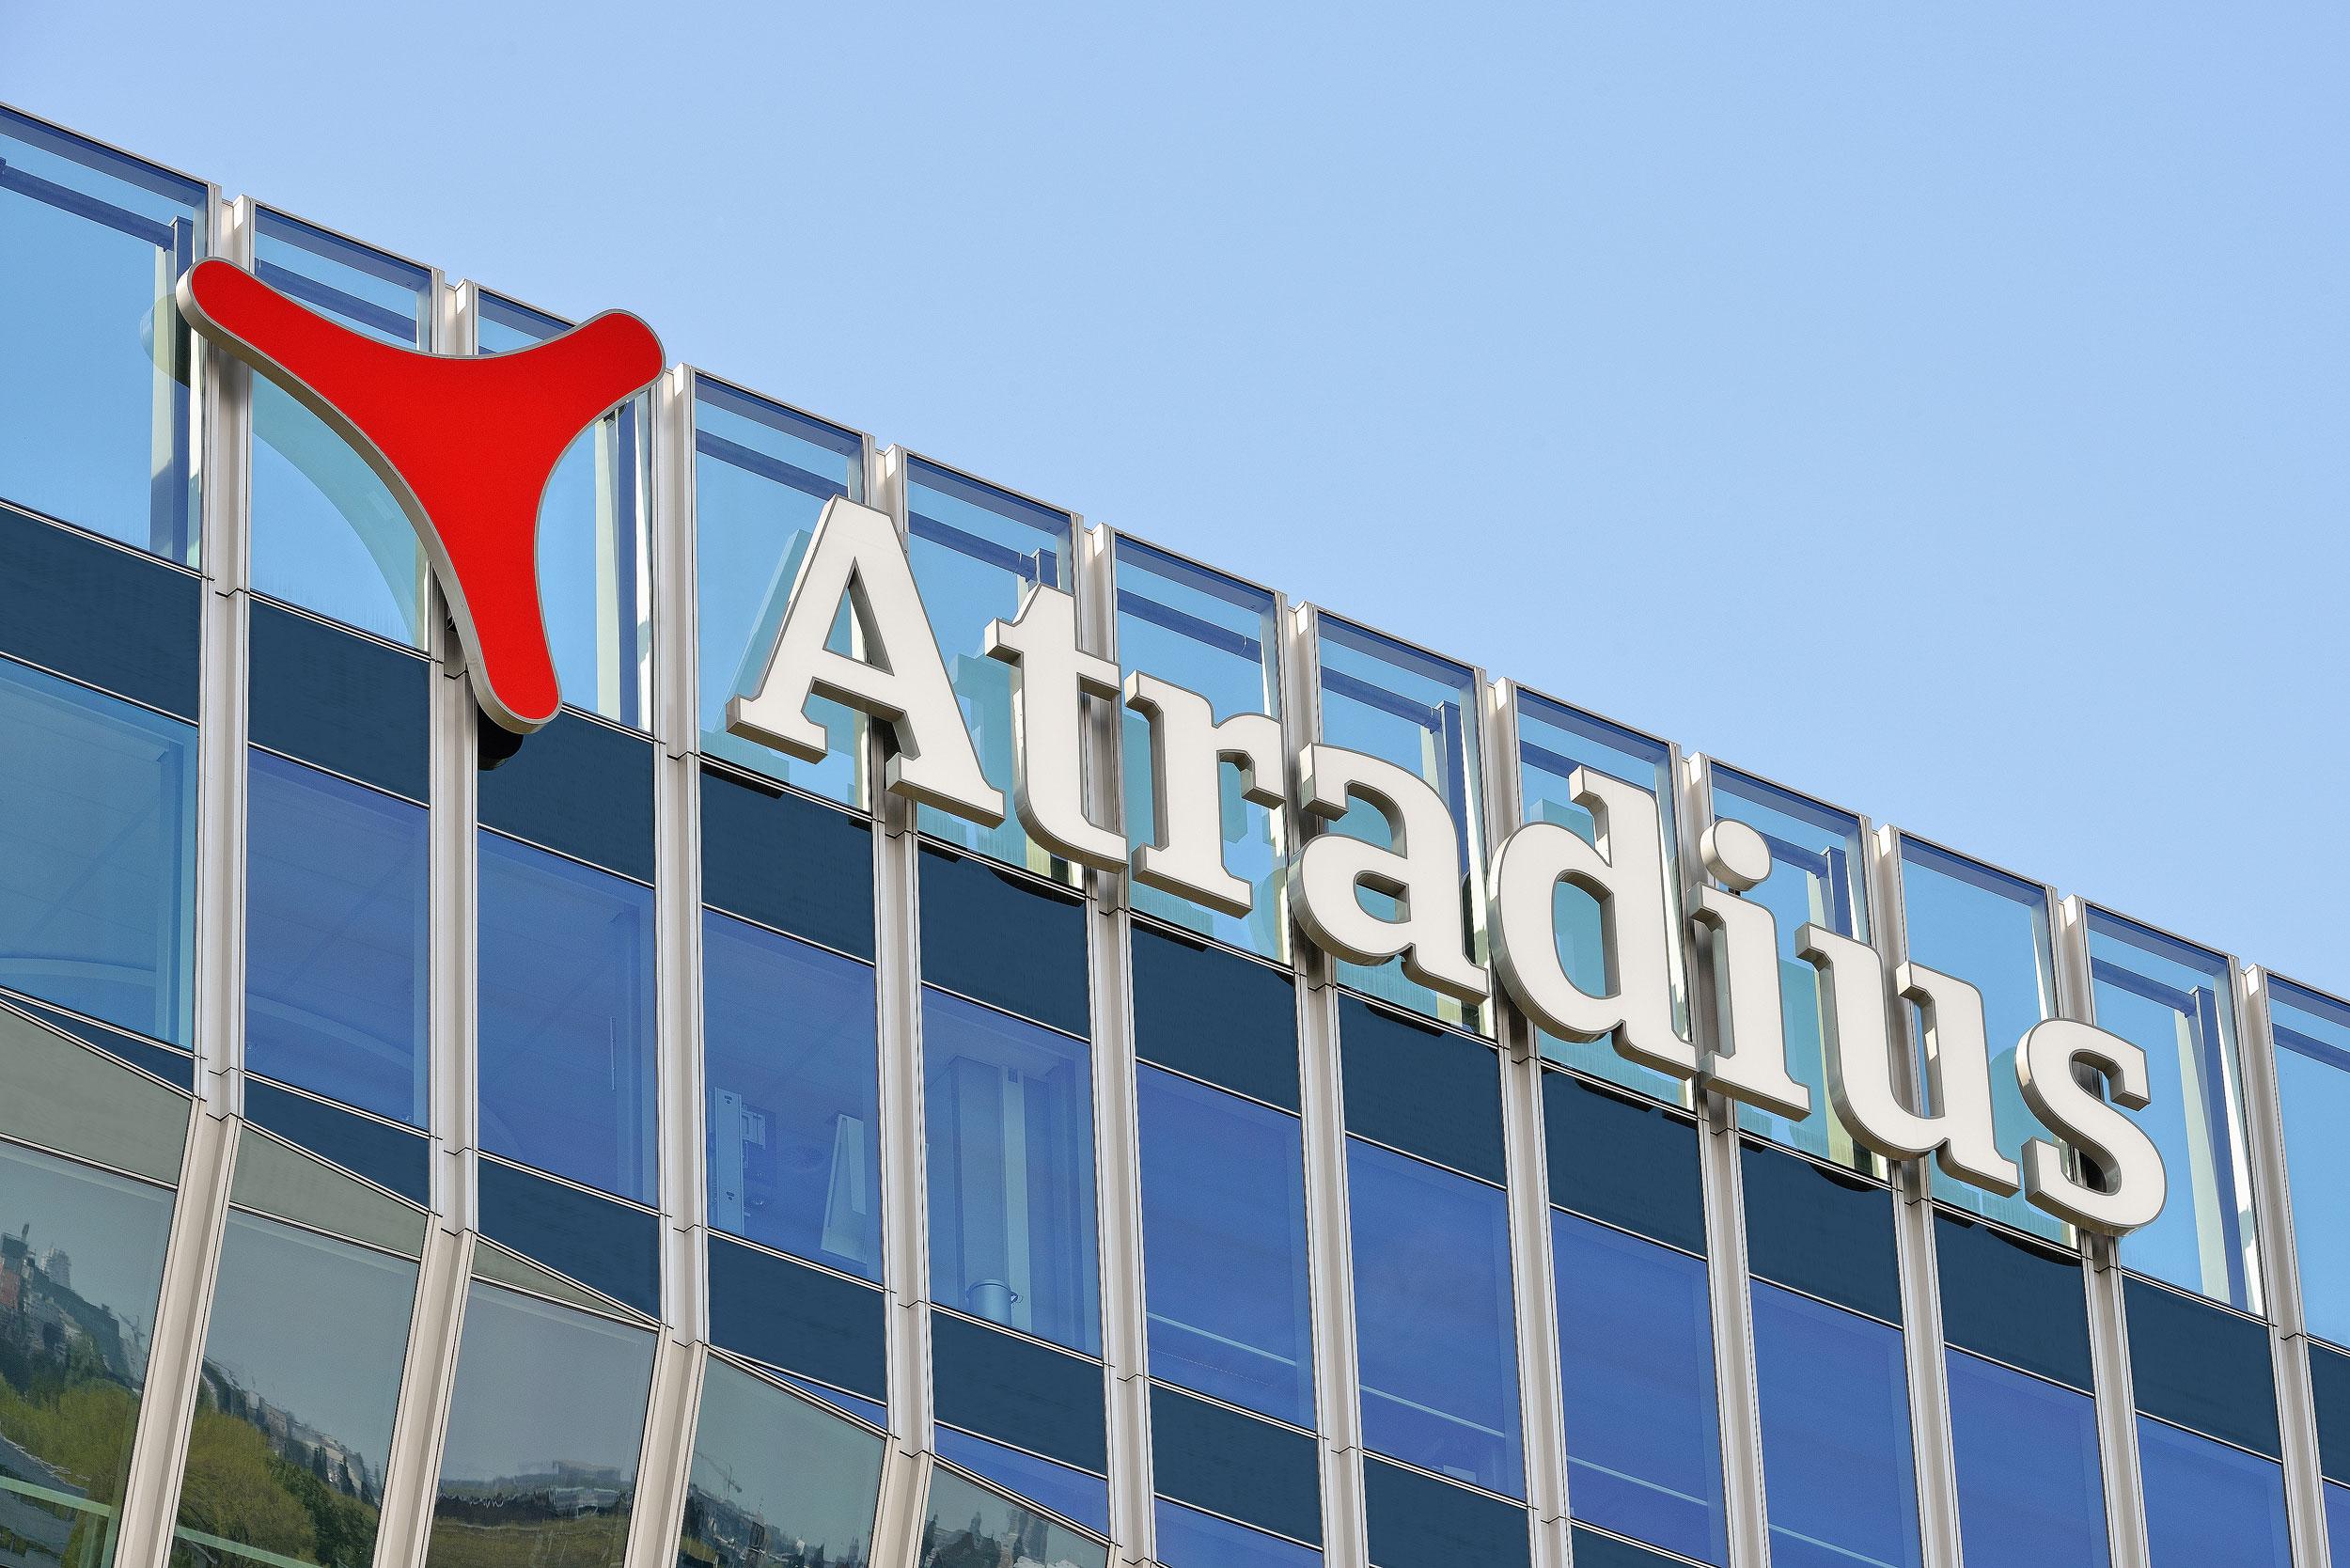 Atradius Hoofdkantoor, Amsterdam - Atradius Group - architectuurfotograaf Chiel de Nooyer